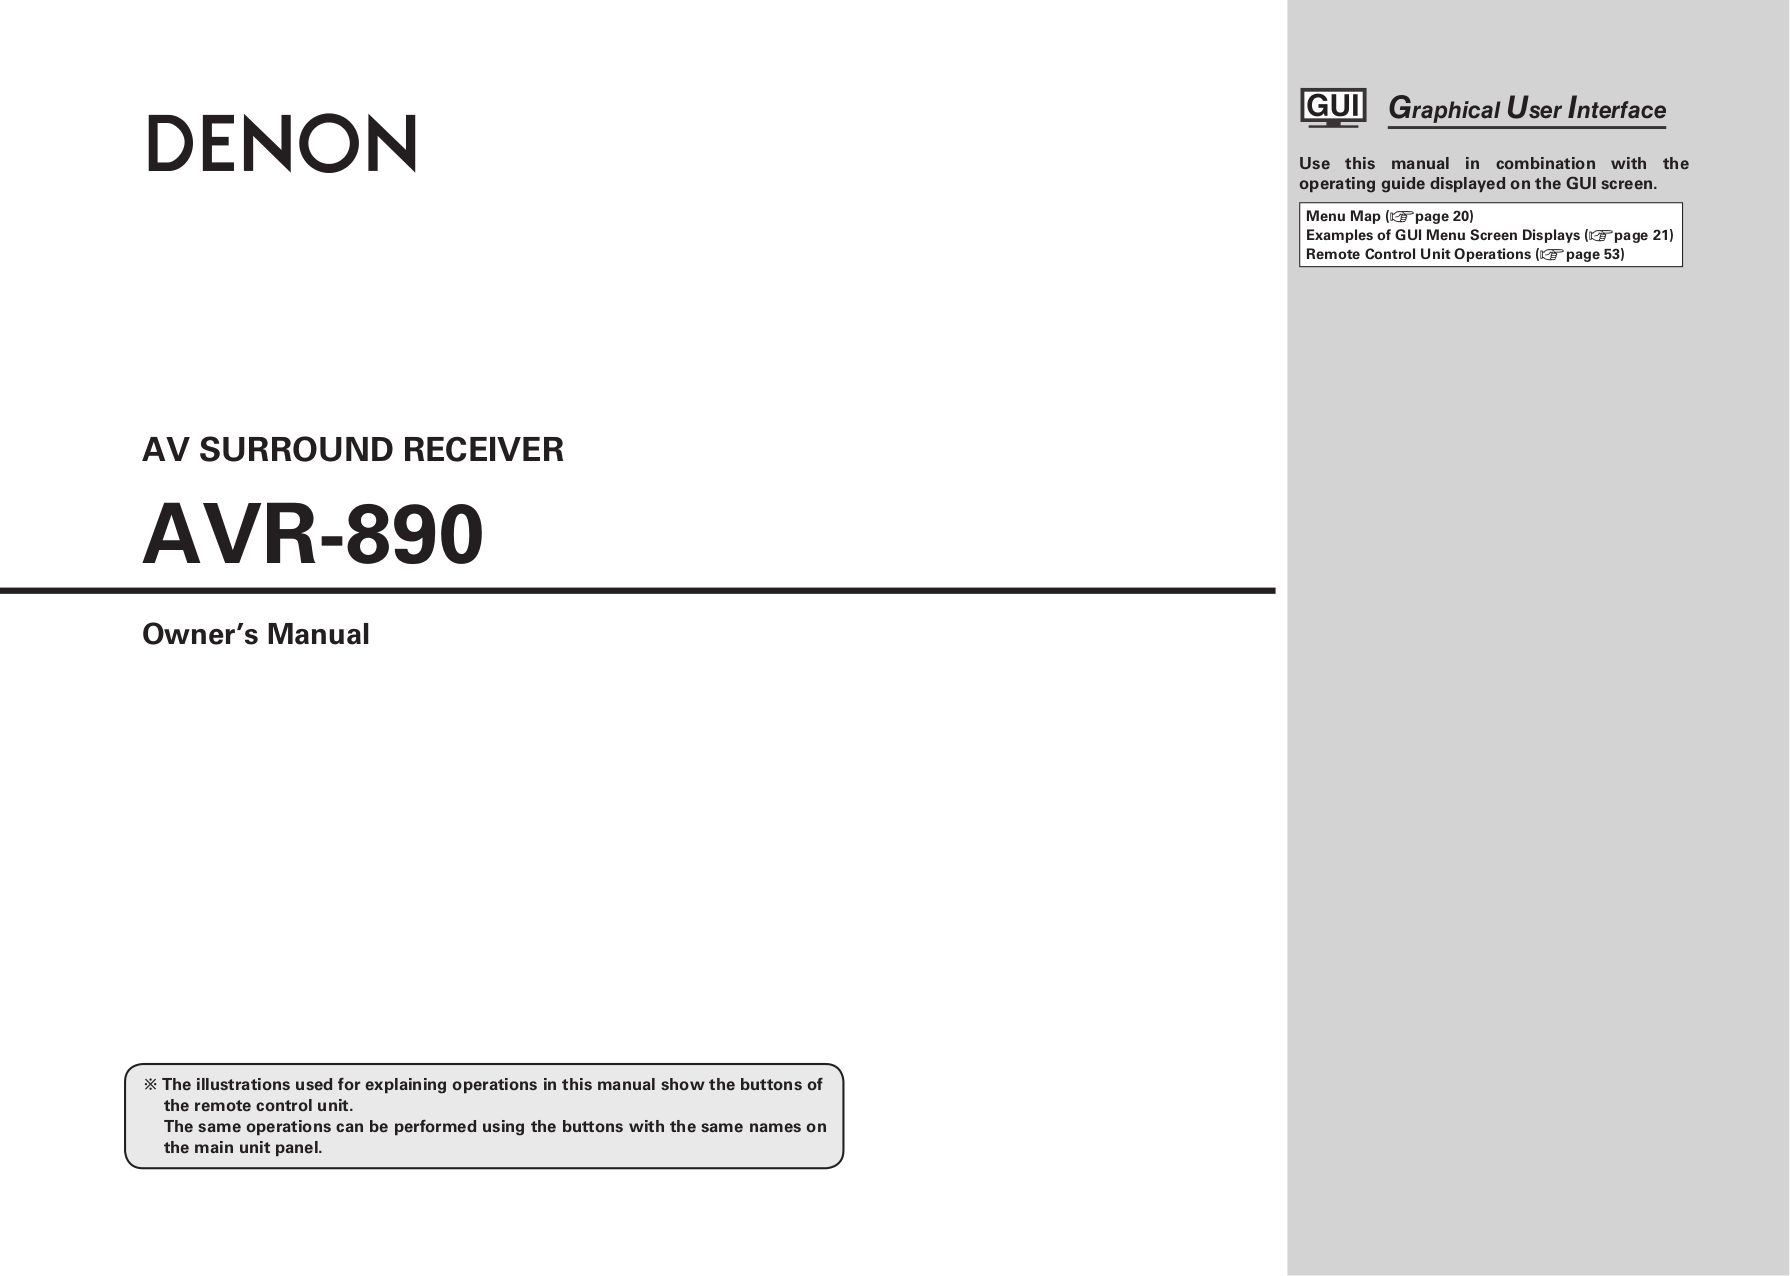 pdf for Lasonic MP3 Player MP-2B manual